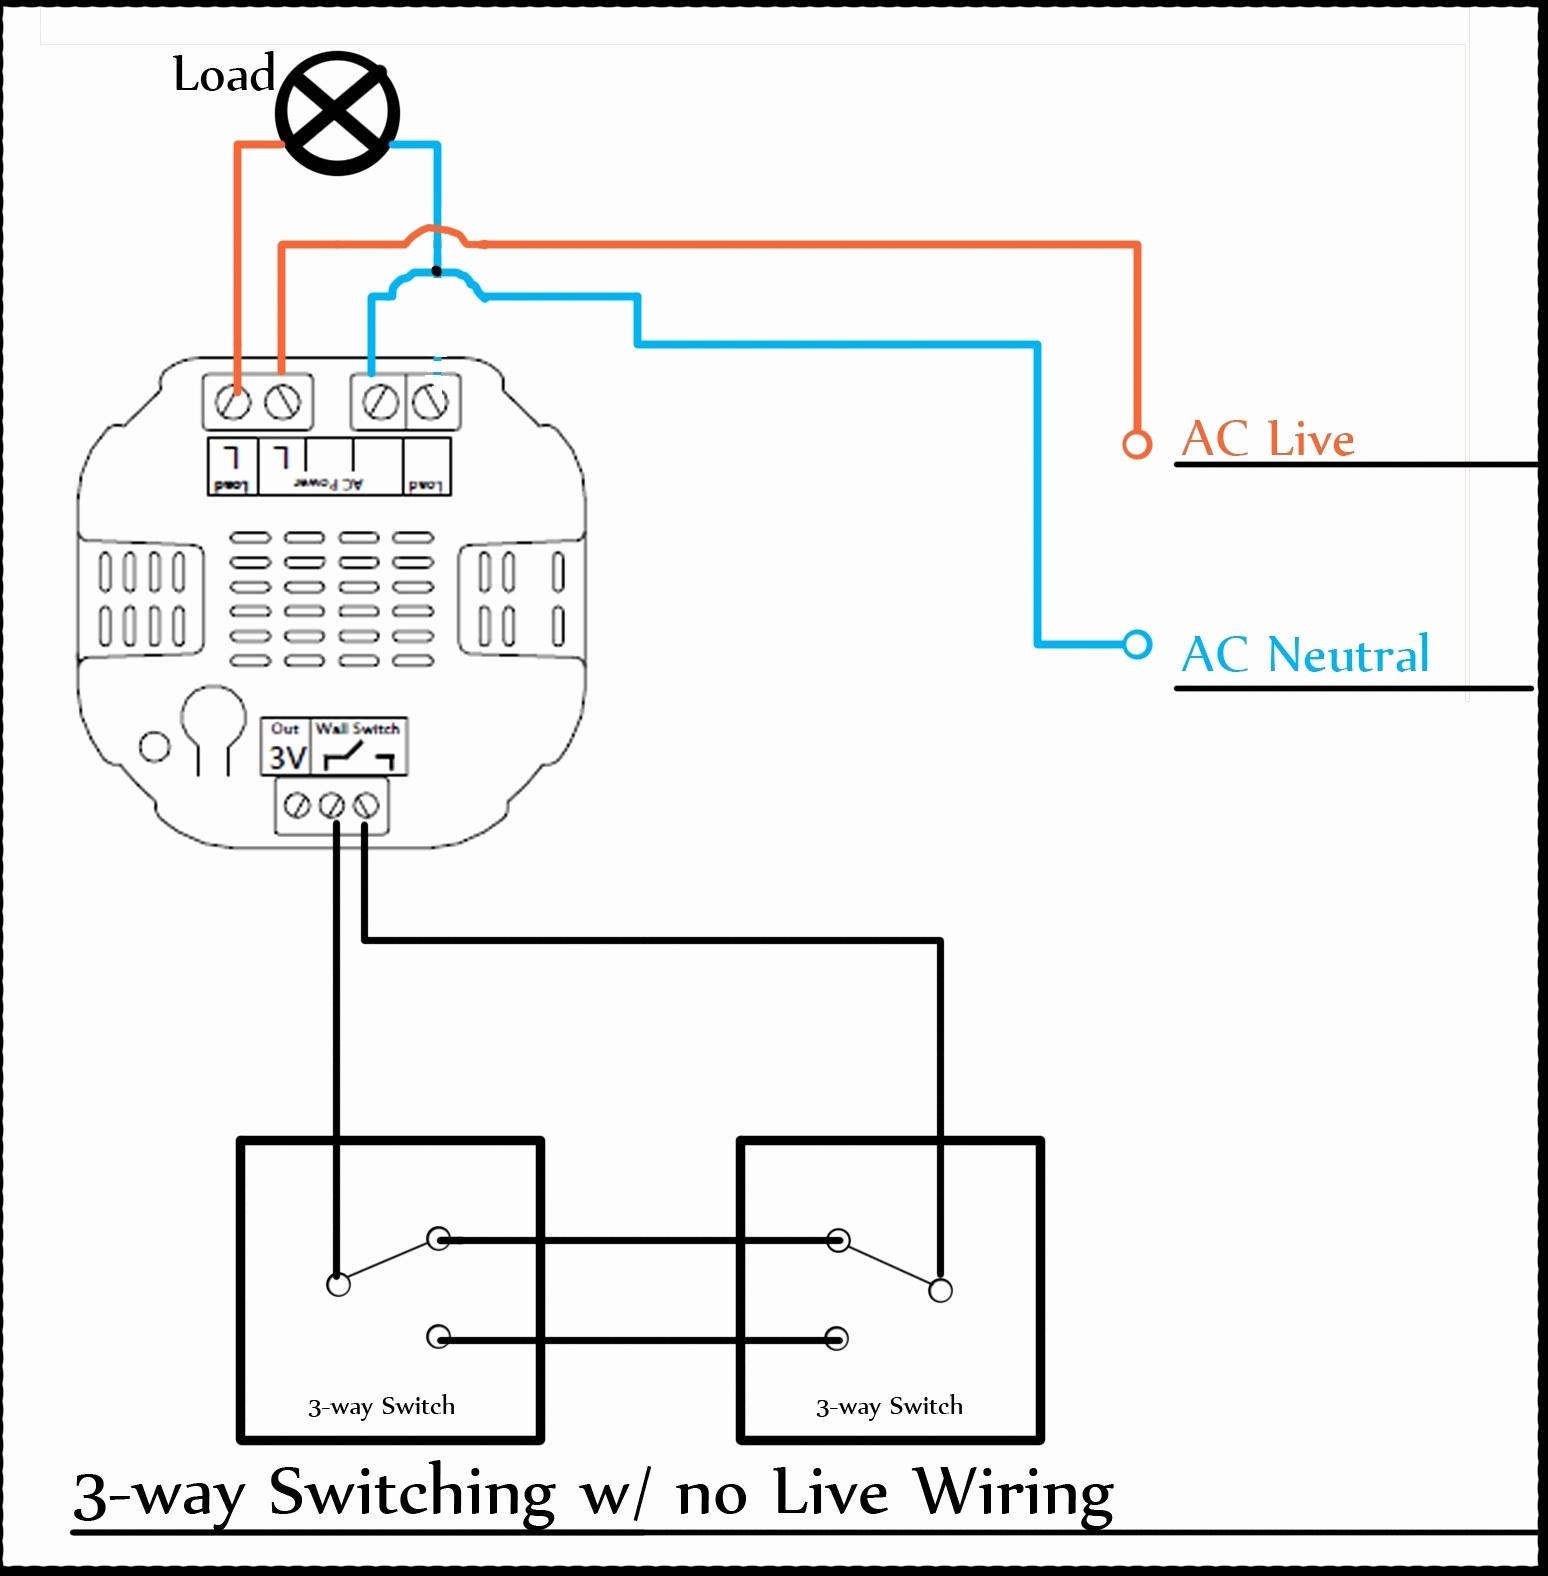 3 Way Switch Wiring Diagram Pdf Beautiful 3 Way Switch Wiring - 4 Way Switch Wiring Diagram Pdf